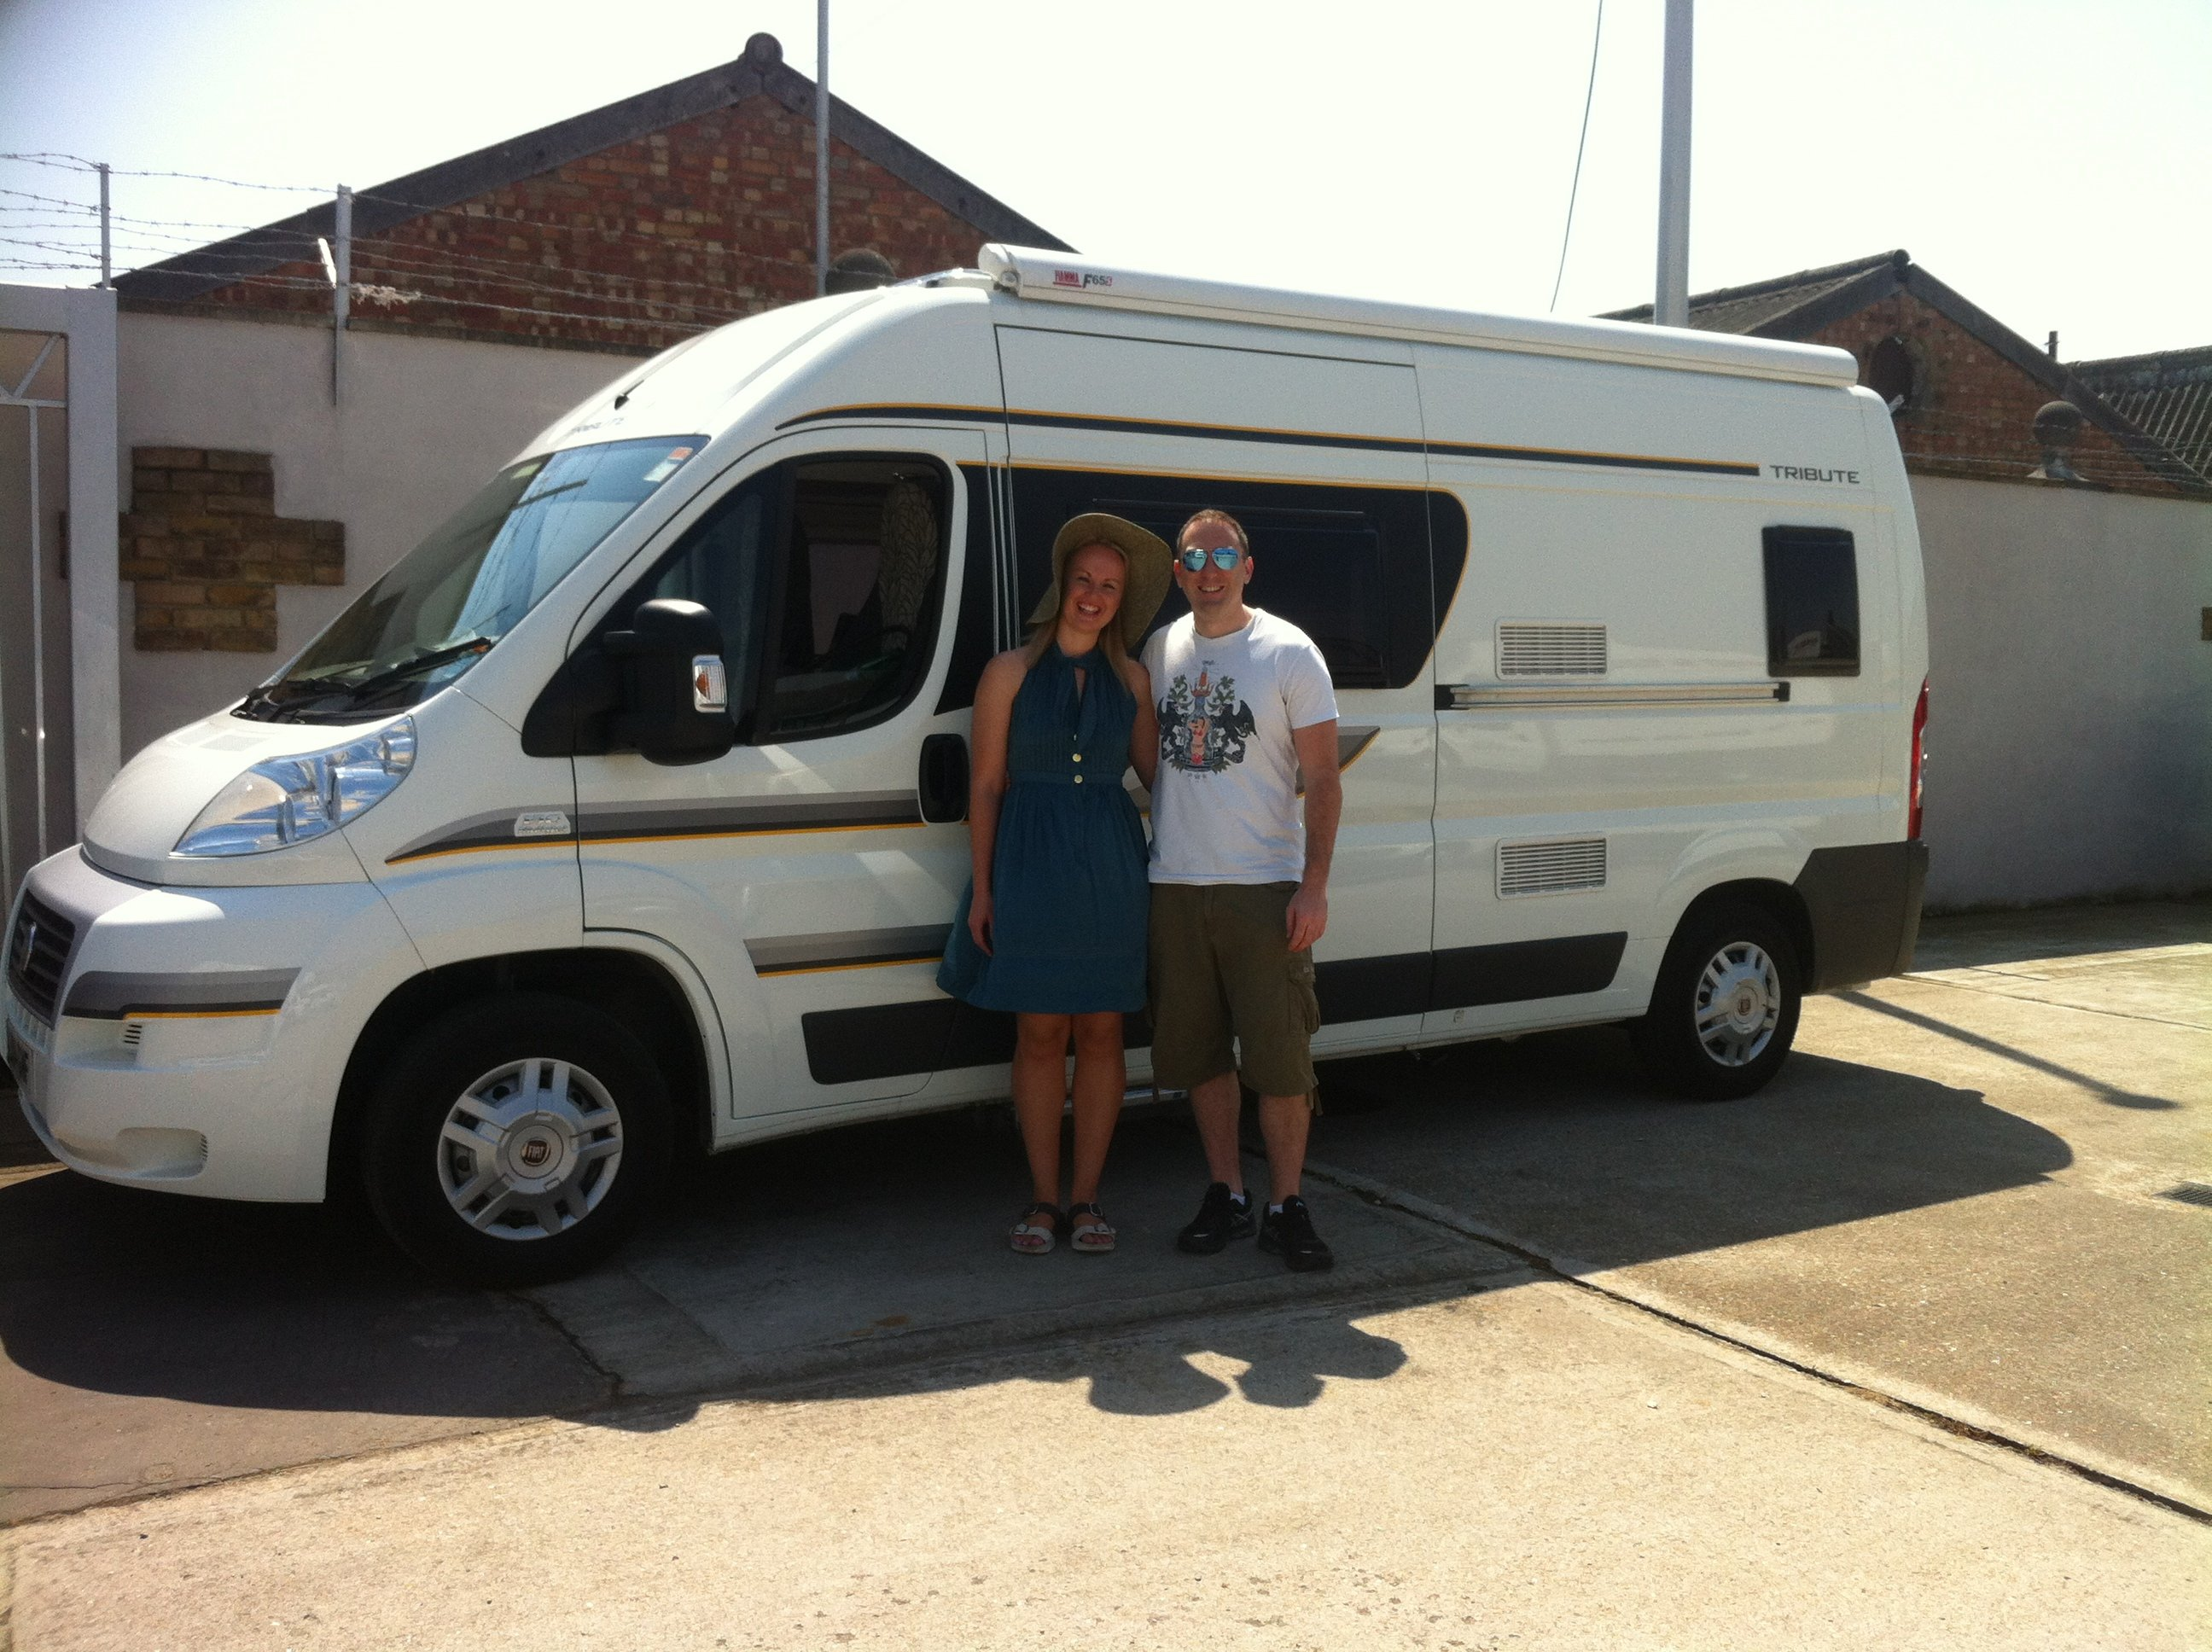 Elegant Customer Reviews  UK Campervan And Motorhome Hire North East England